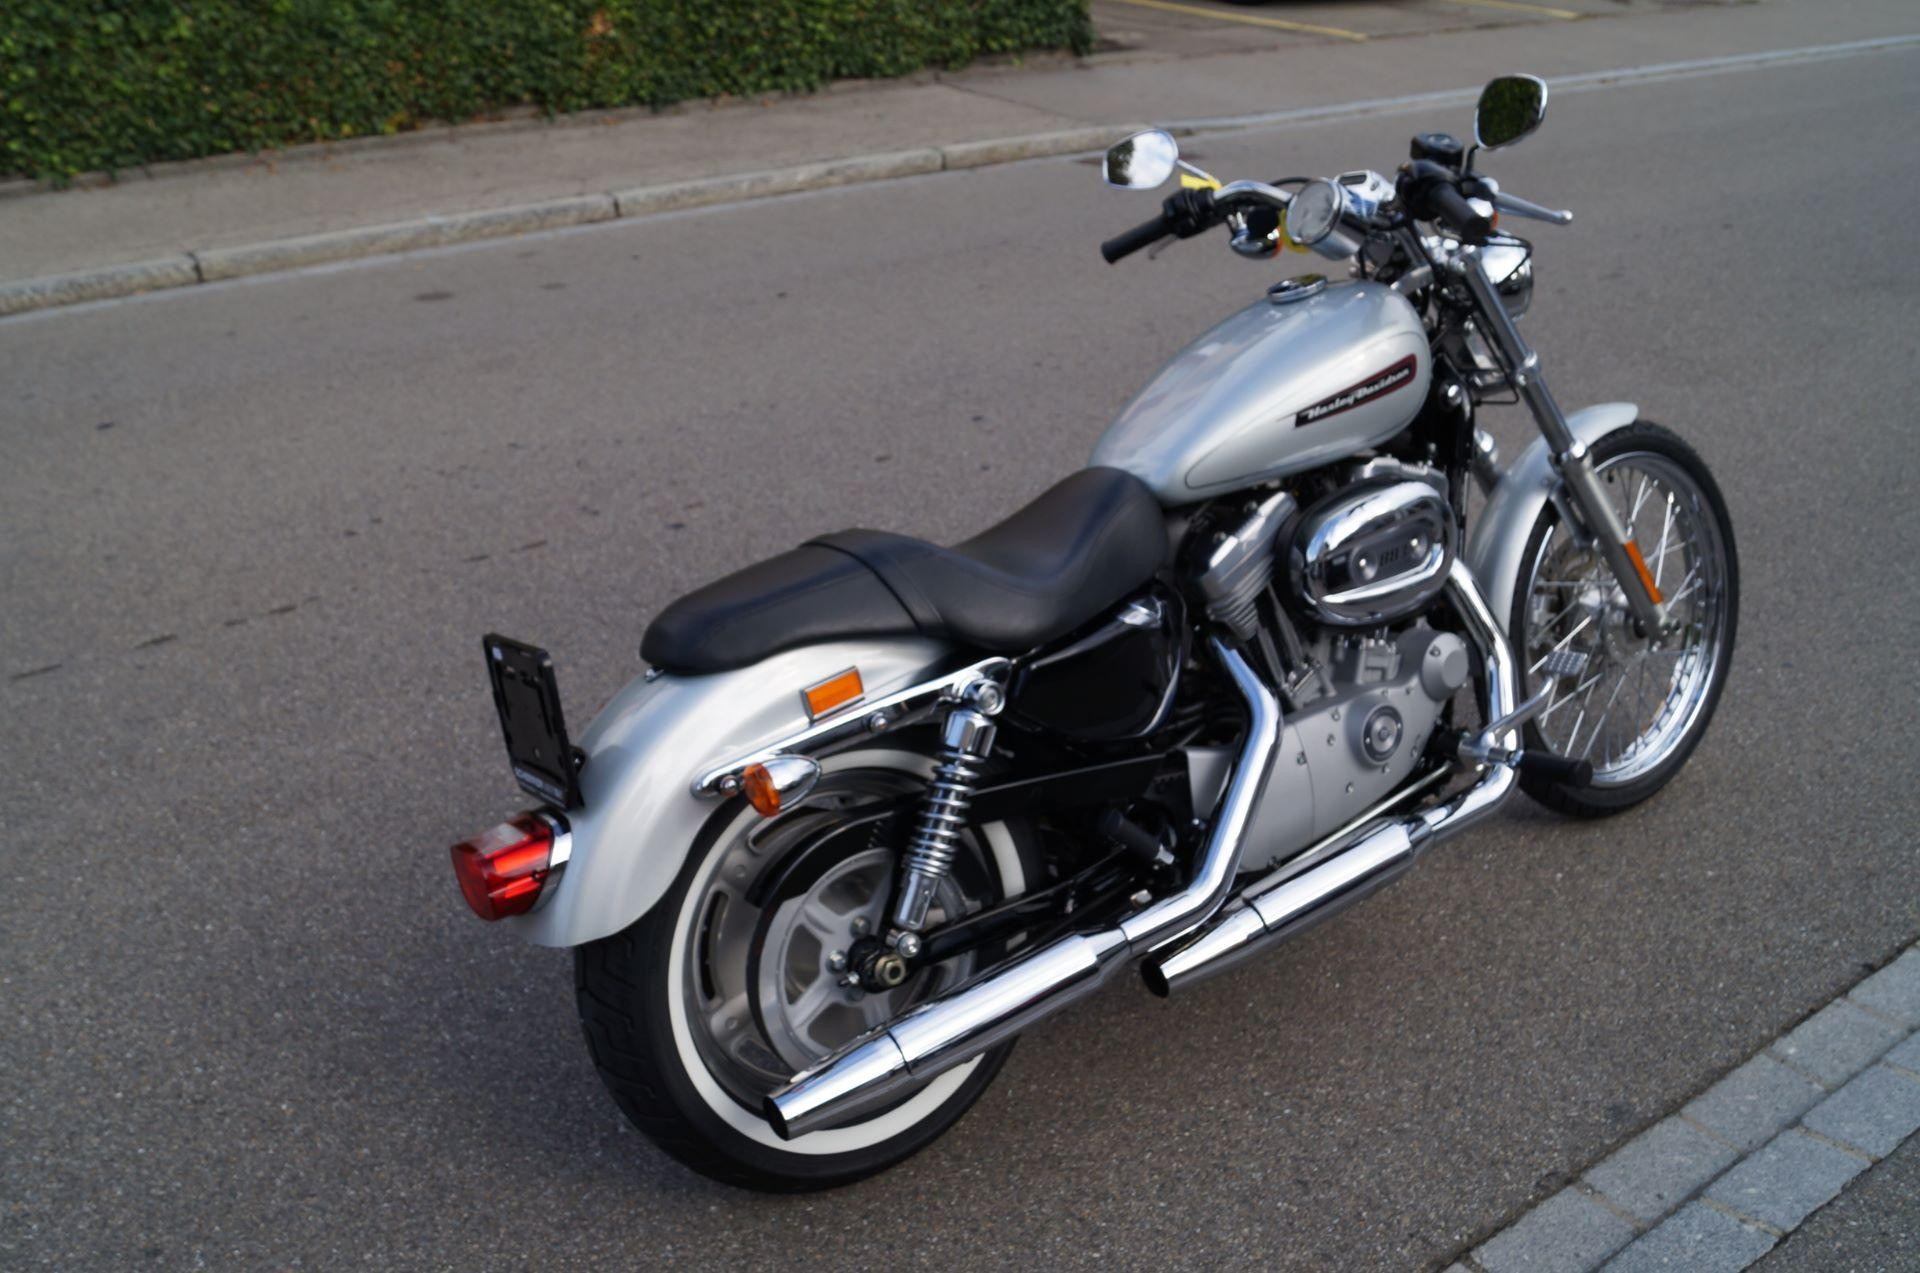 motorrad occasion kaufen harley davidson xl 883c sportster custom scherrer motos ag steckborn. Black Bedroom Furniture Sets. Home Design Ideas